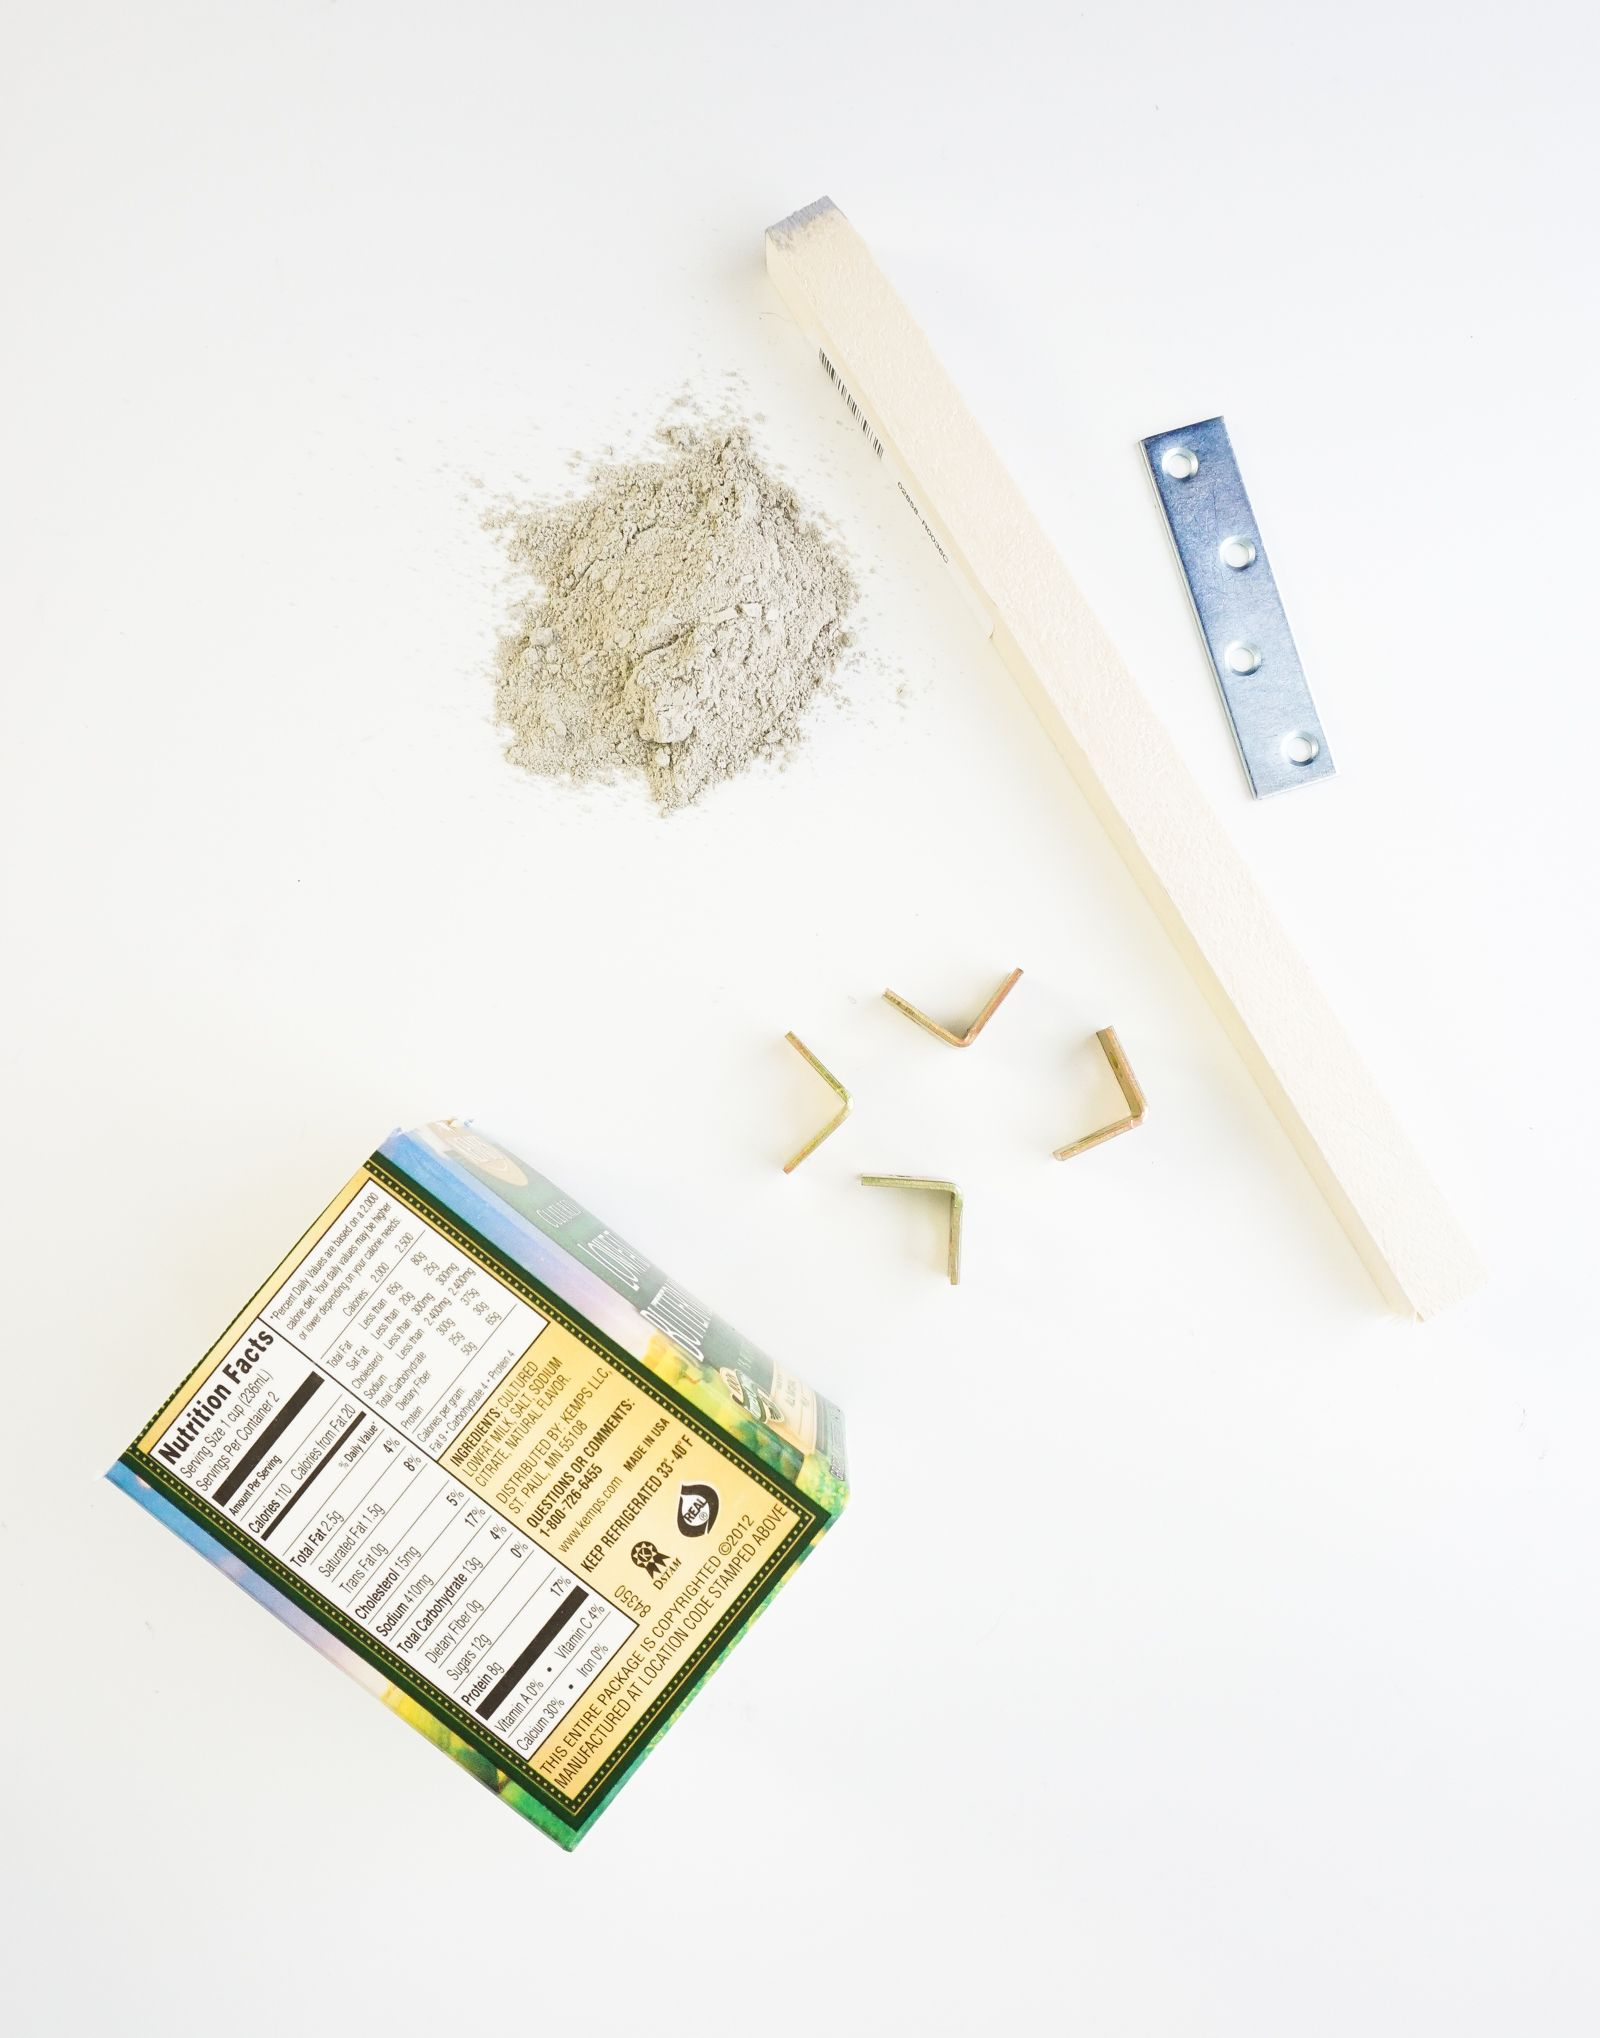 Materials for concrete wooden plante